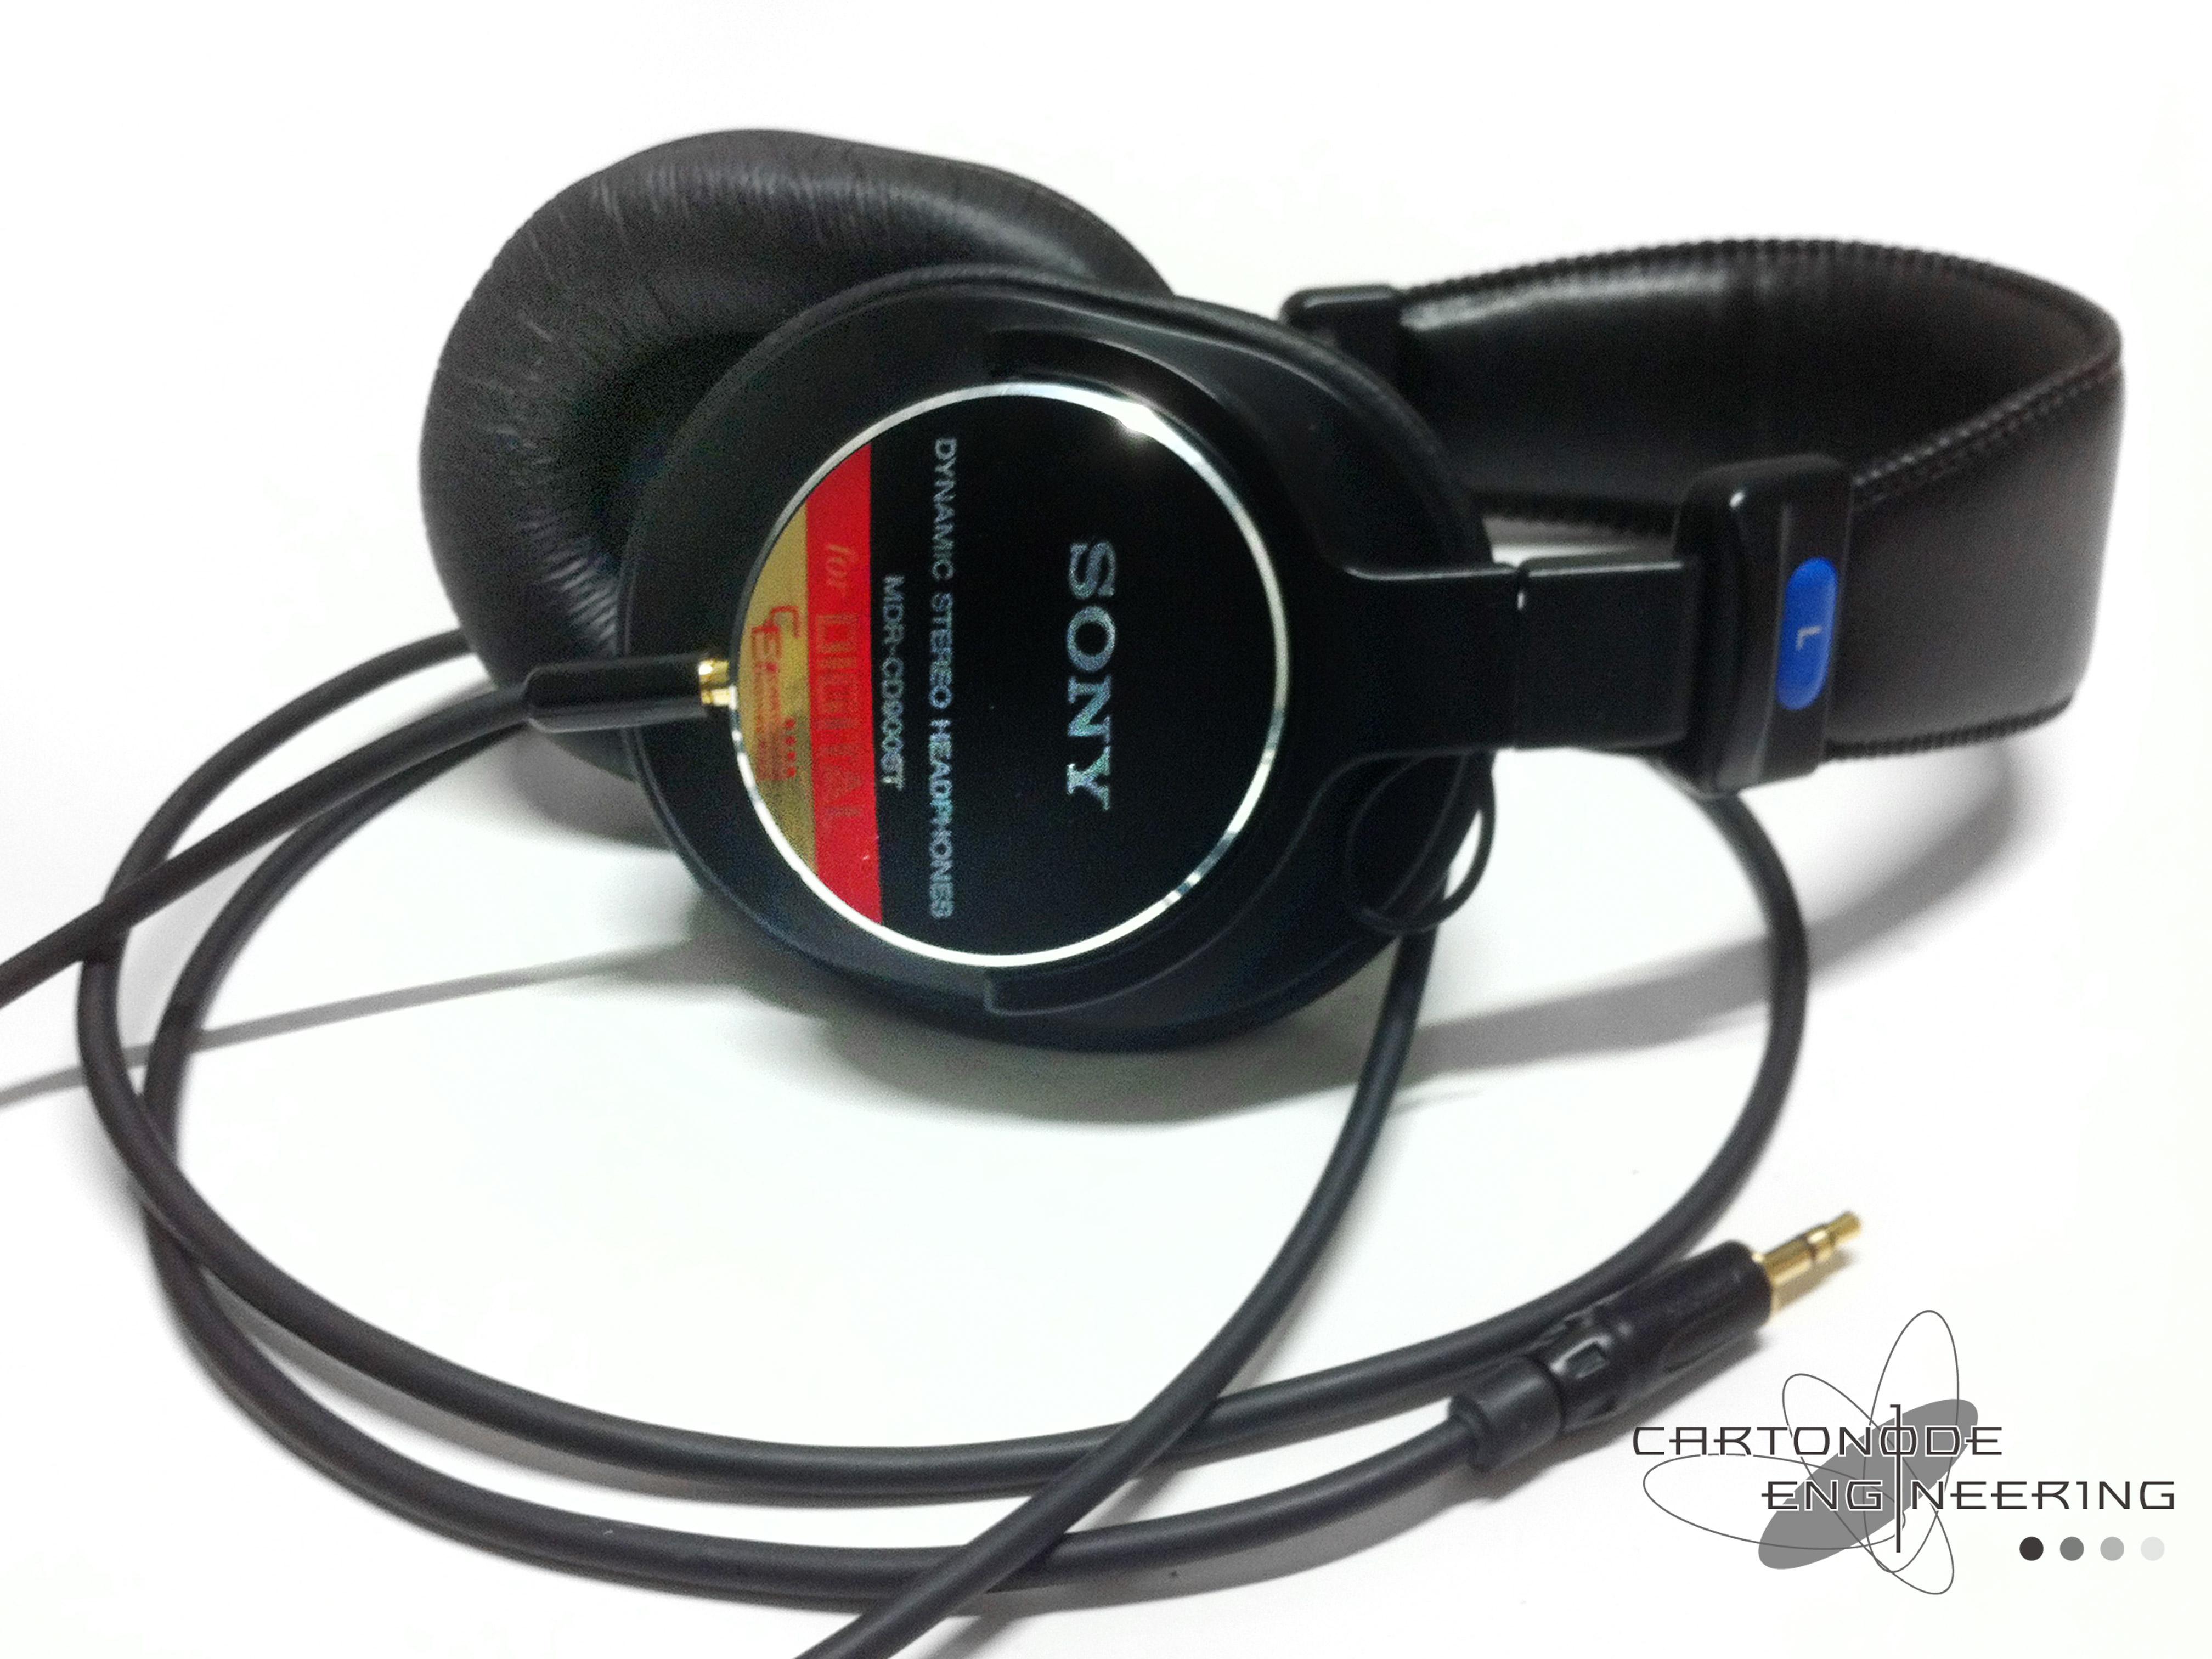 MDR-CD900ST アンバランス駆動 ケーブル脱着仕様